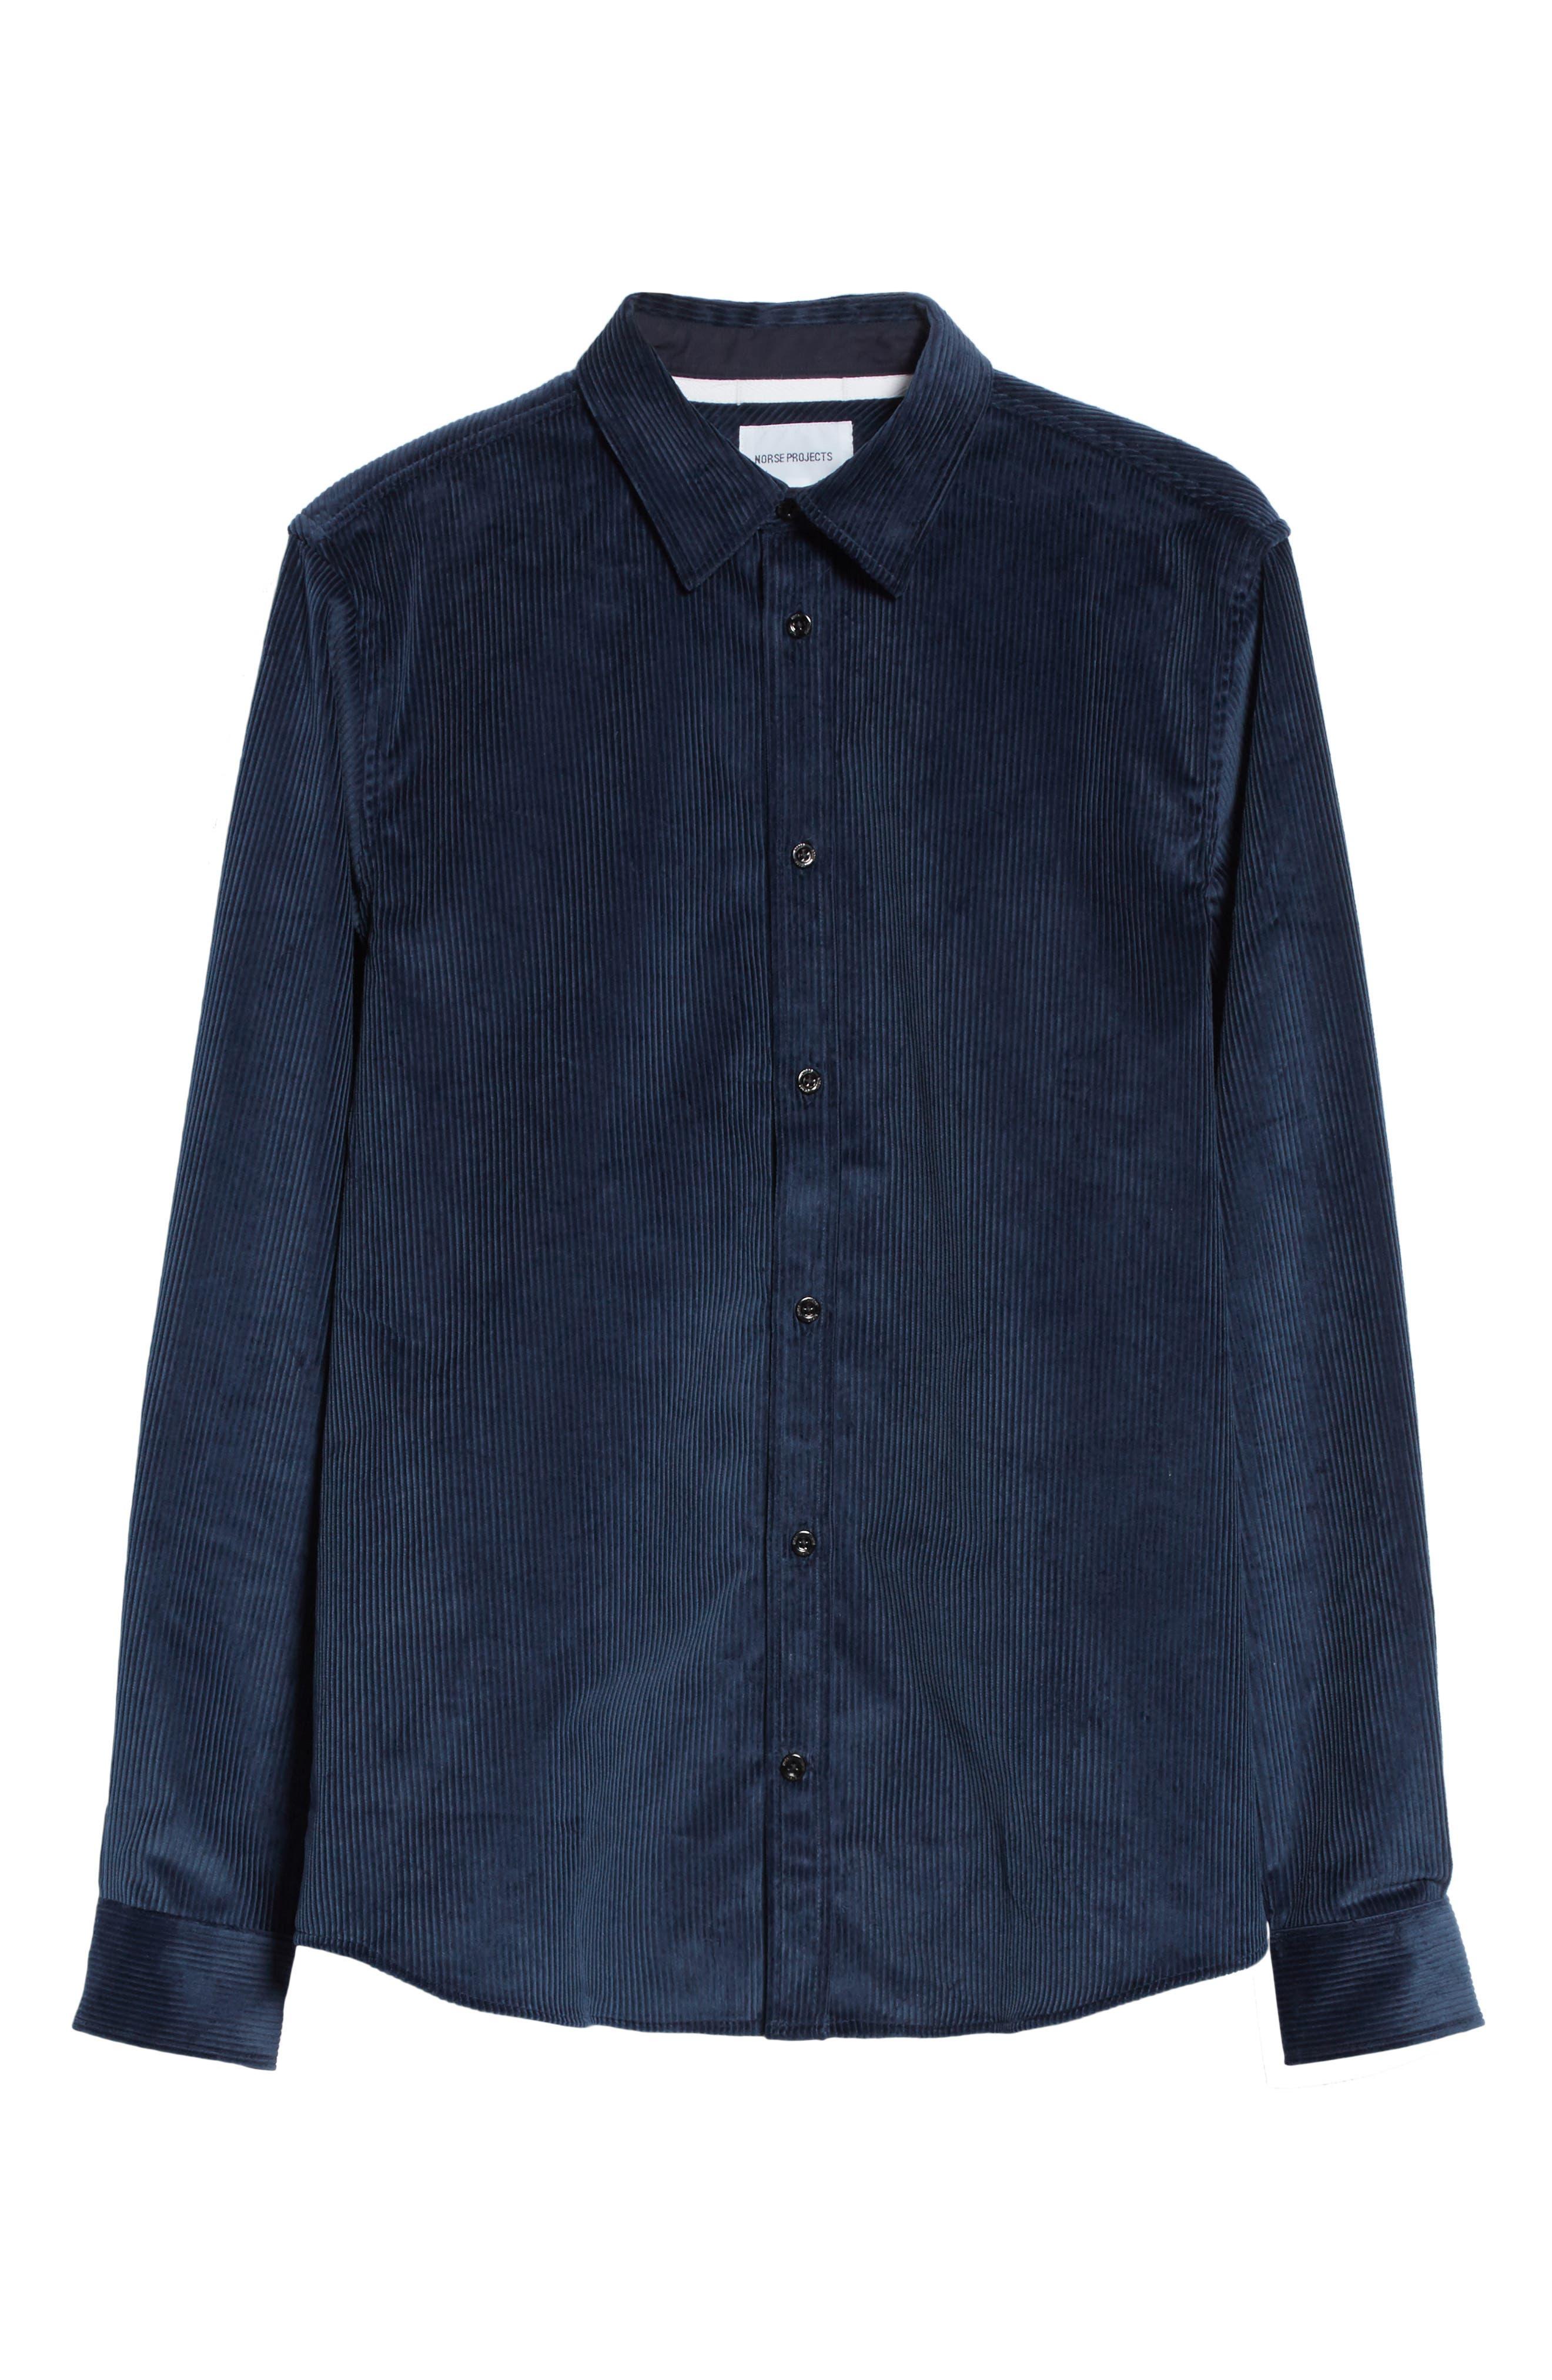 Hans Corduroy Shirt,                             Alternate thumbnail 6, color,                             405